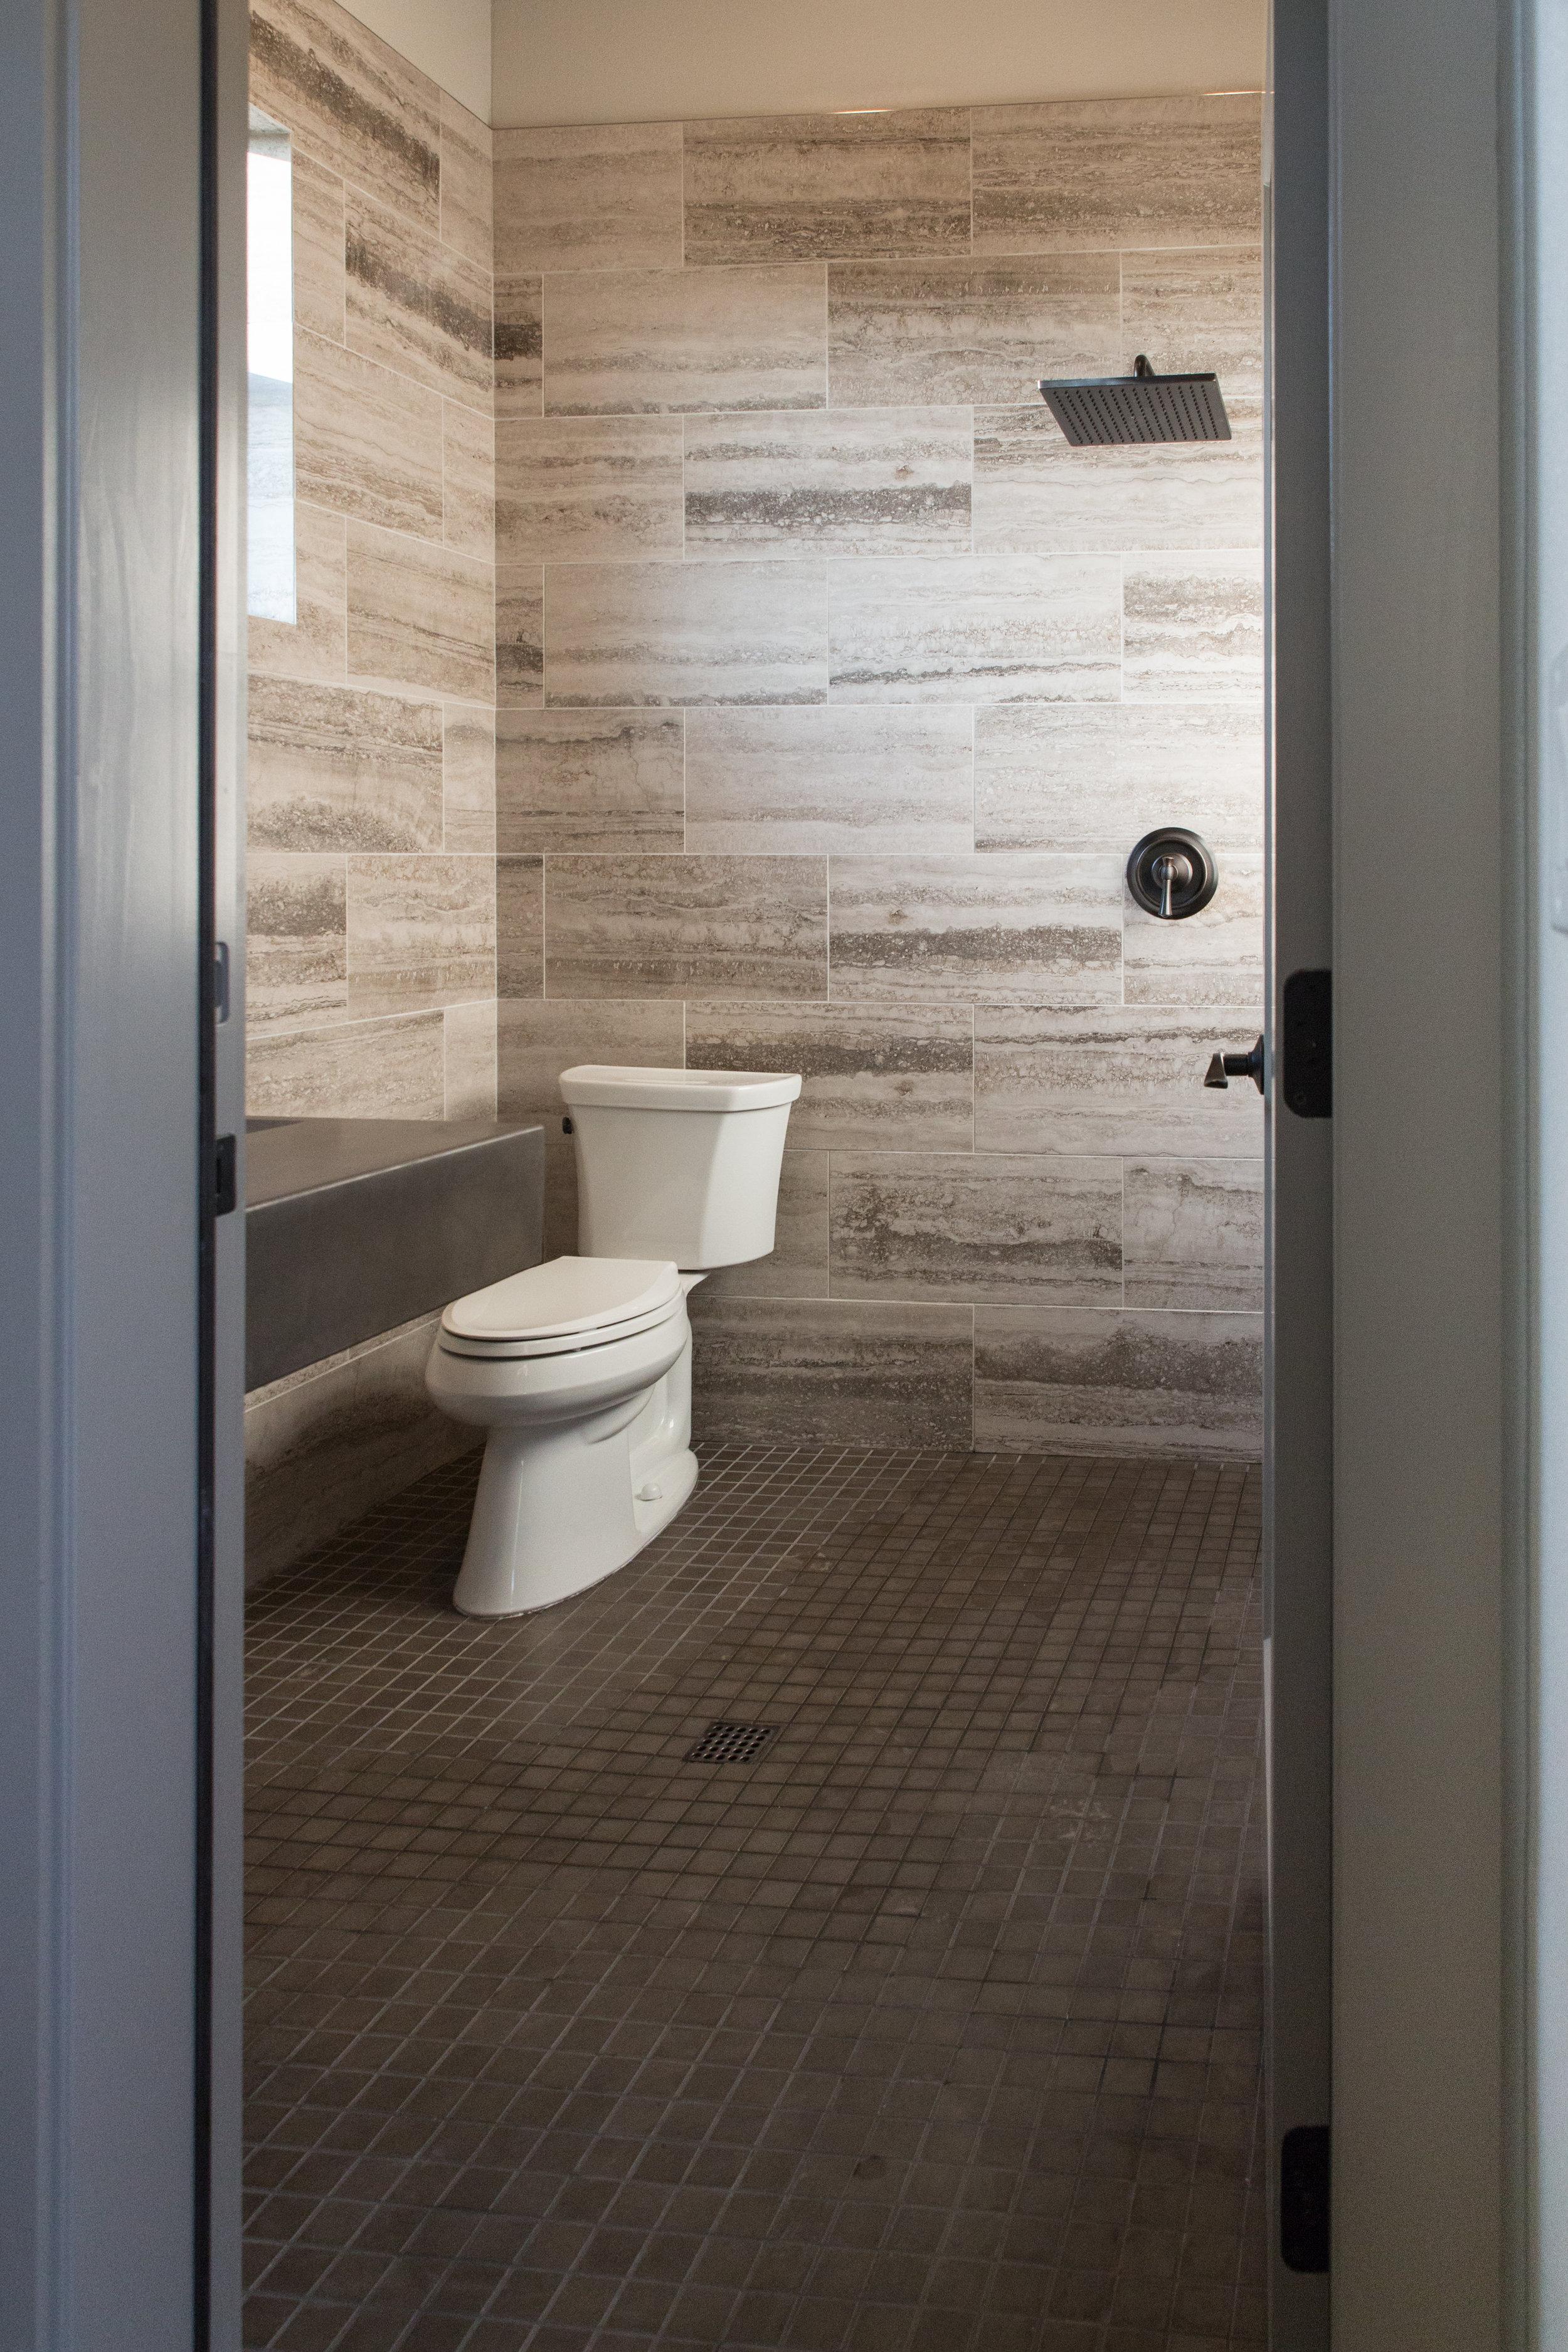 Cabana Bathroom with Shower